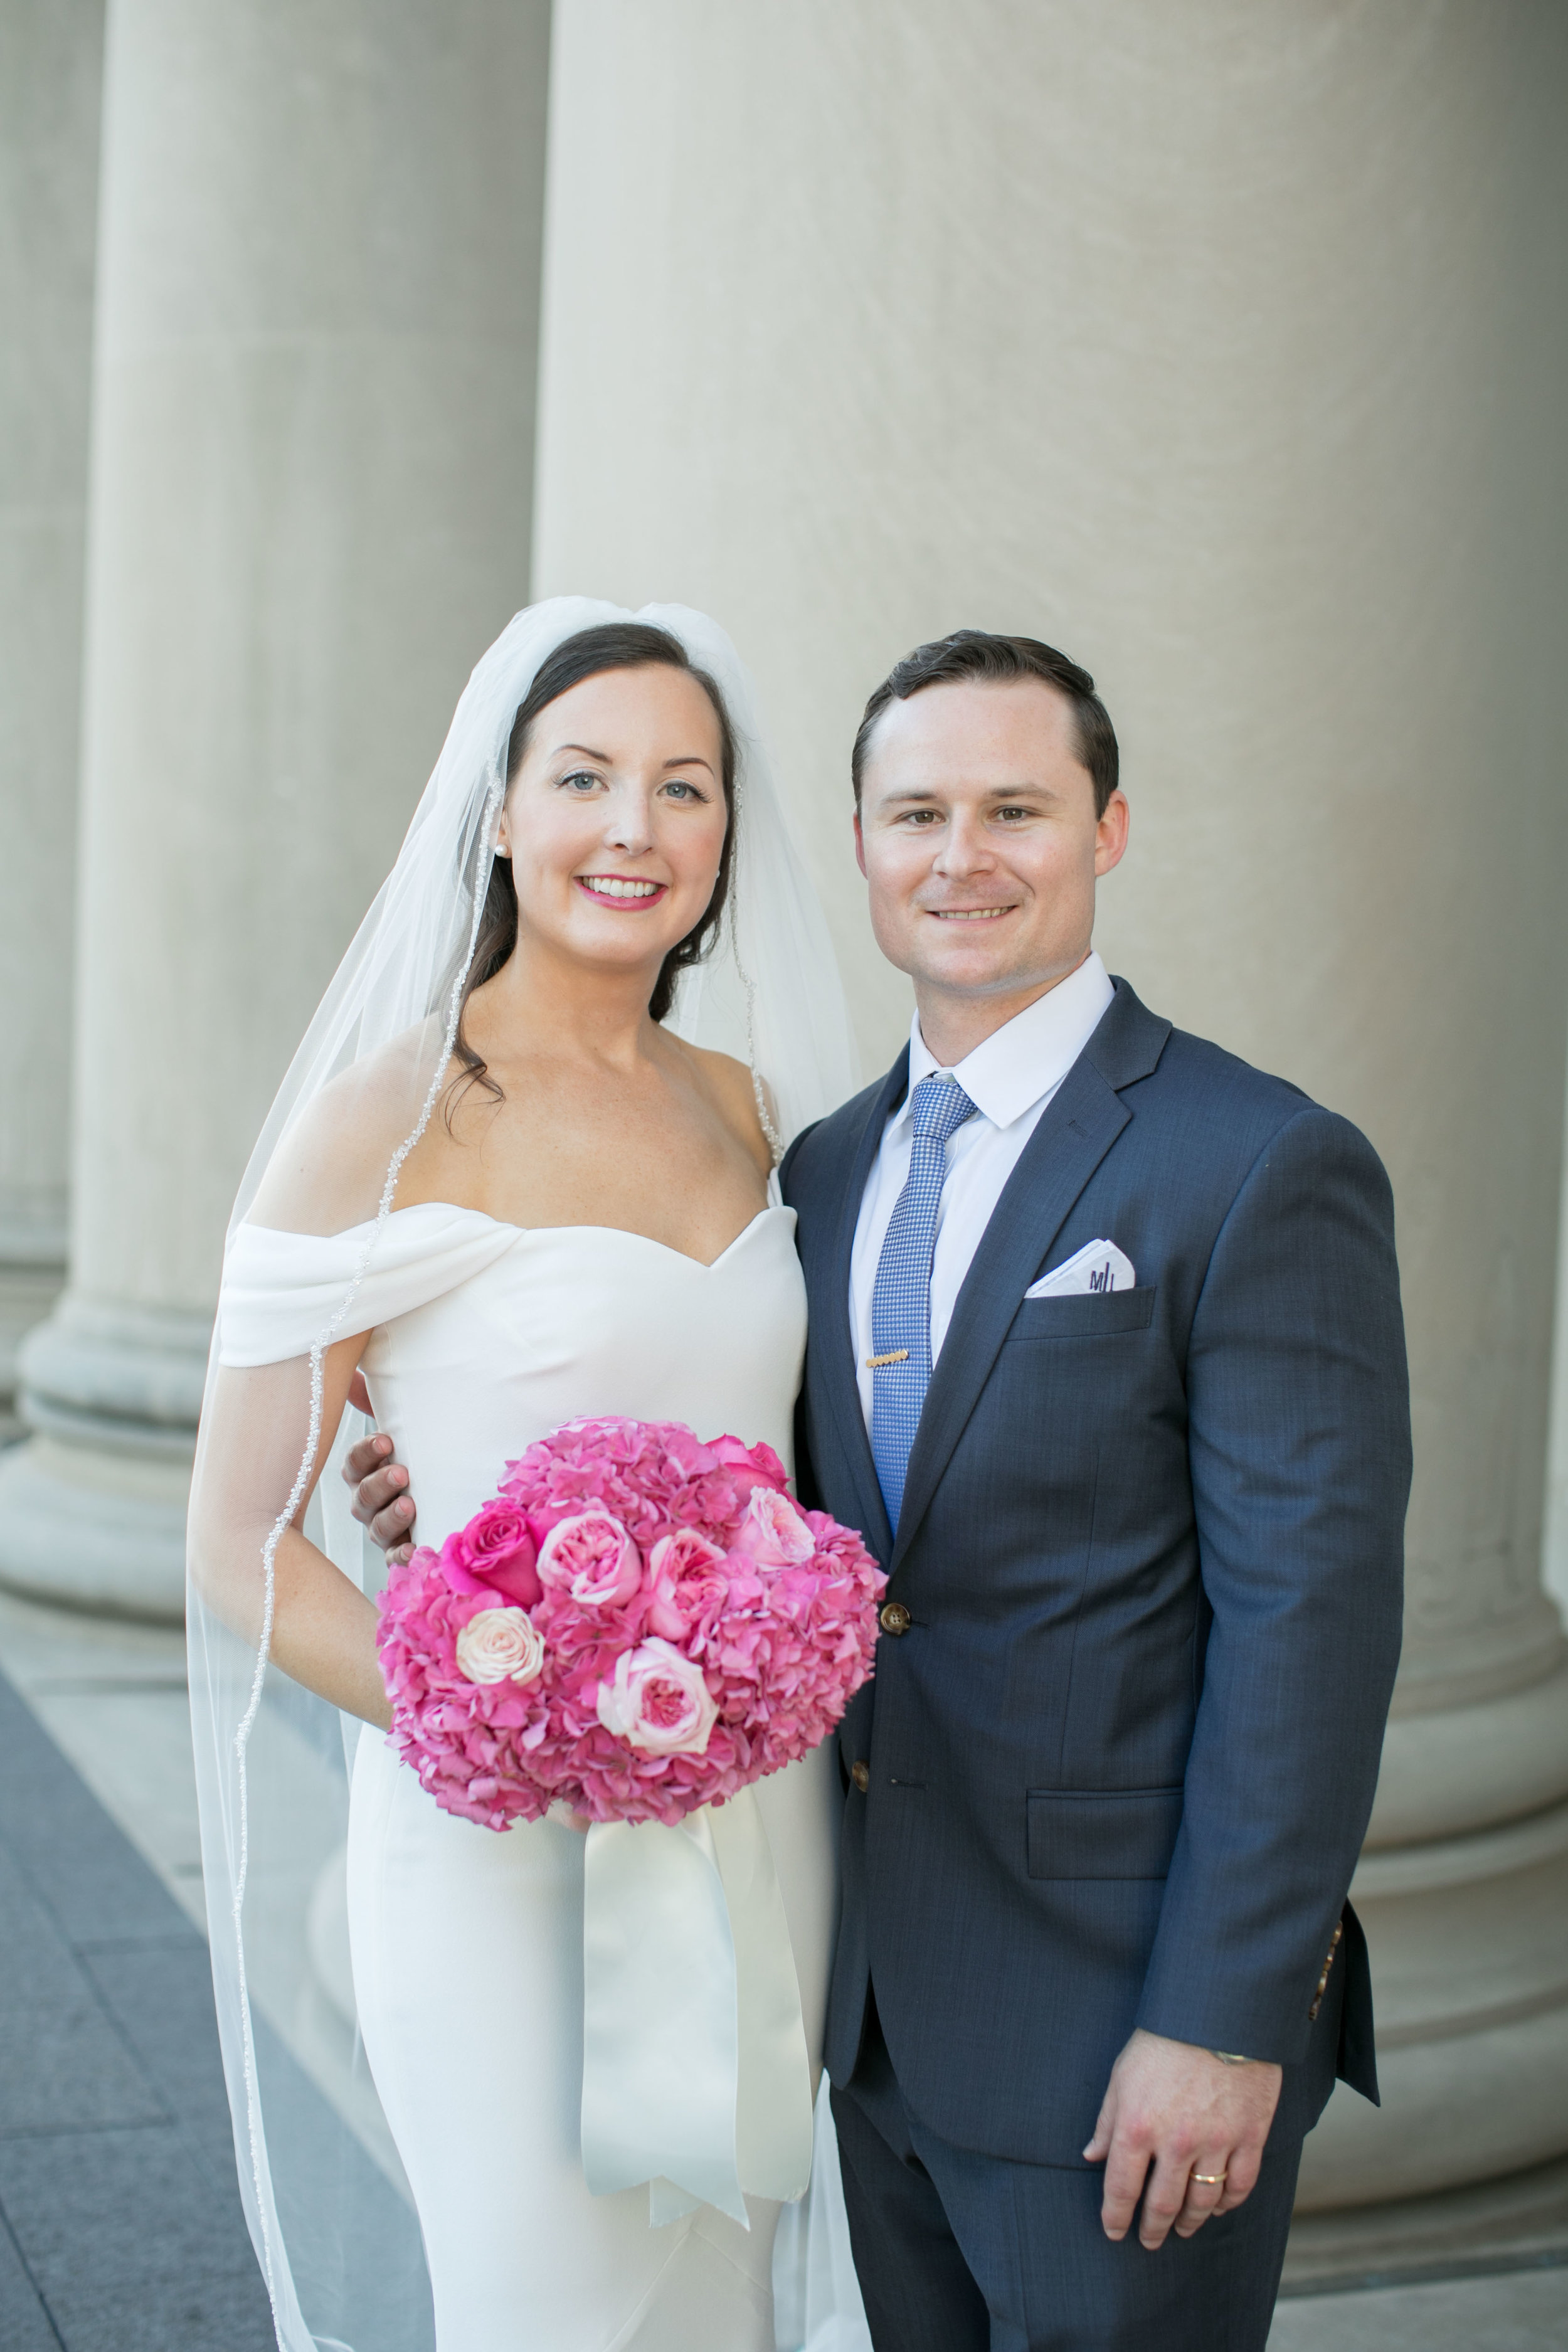 nelson-atkins-wedding-56.jpg